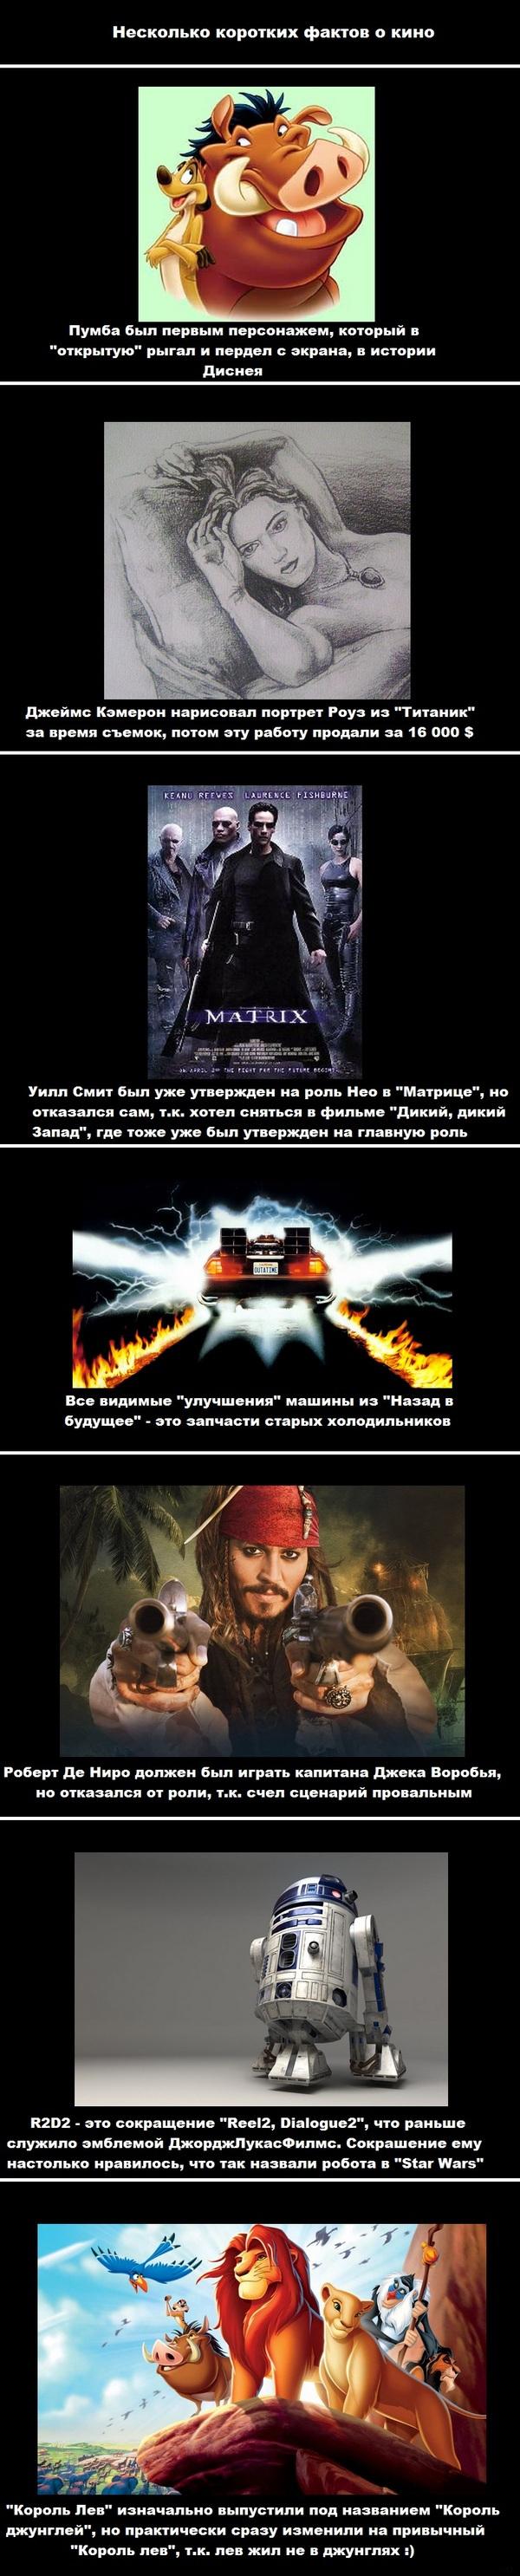 Факты про кино